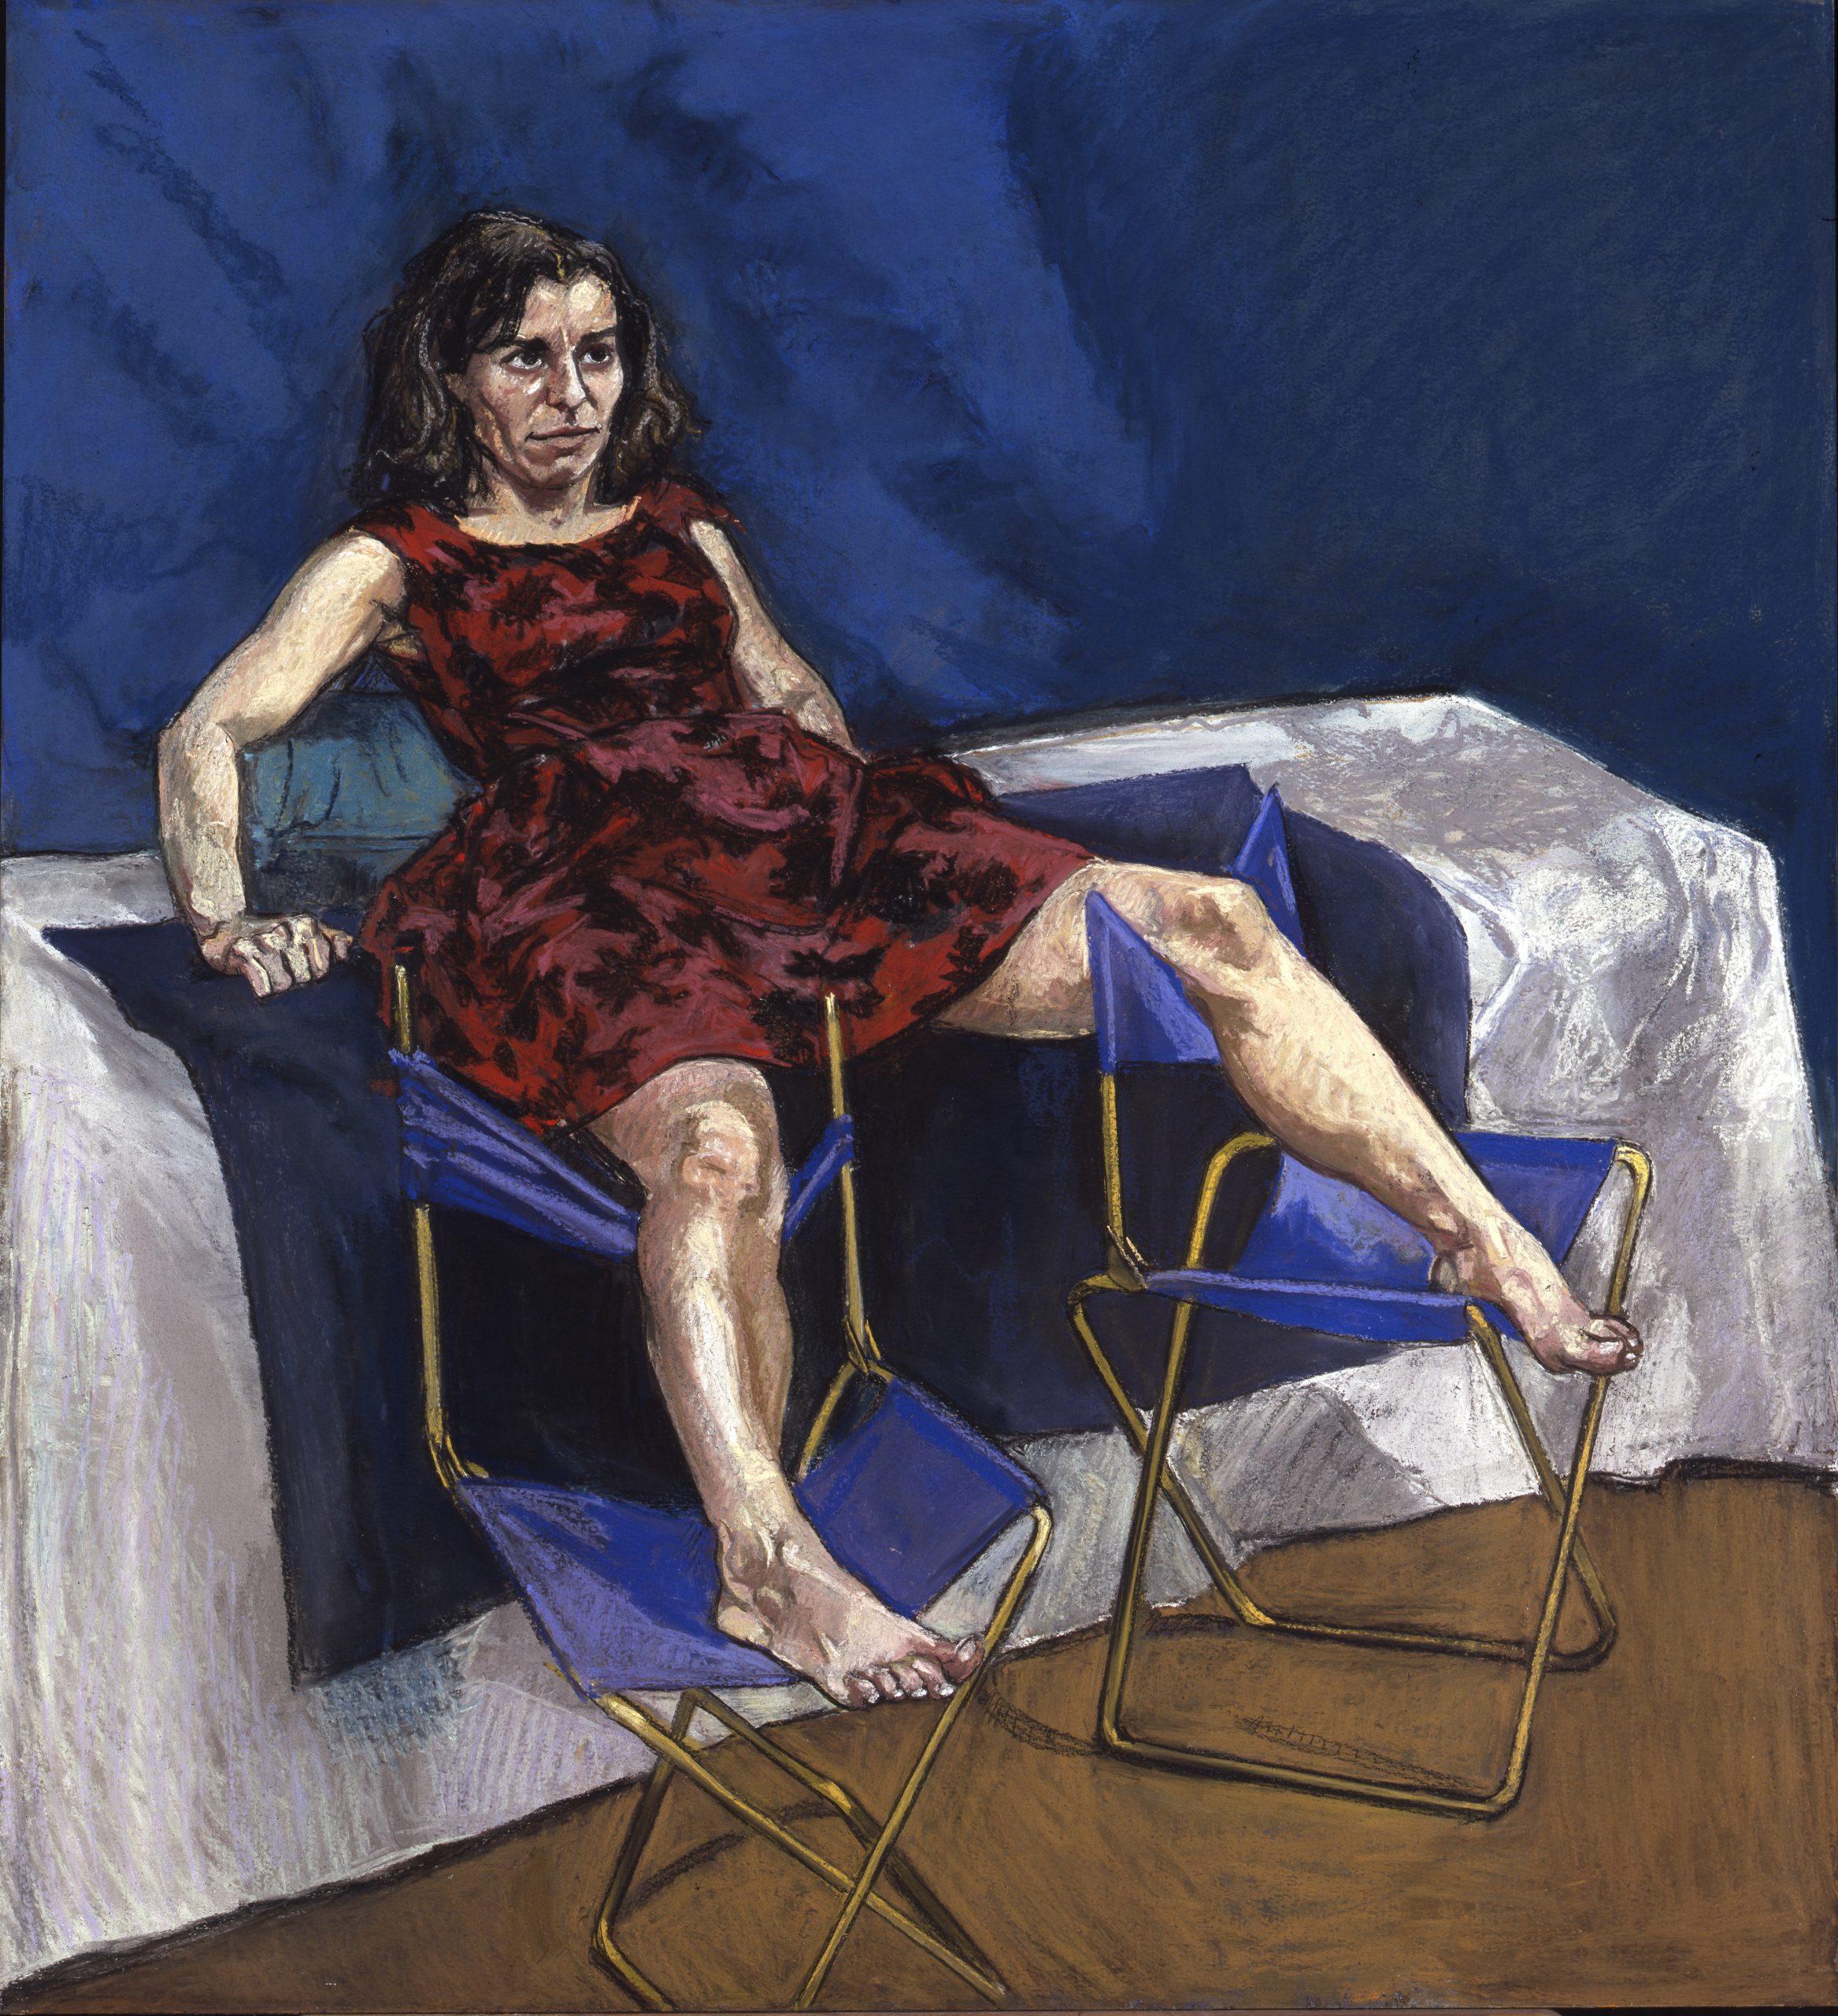 Paula Rego, Untitled No.5, 1998. Courtesy the artist